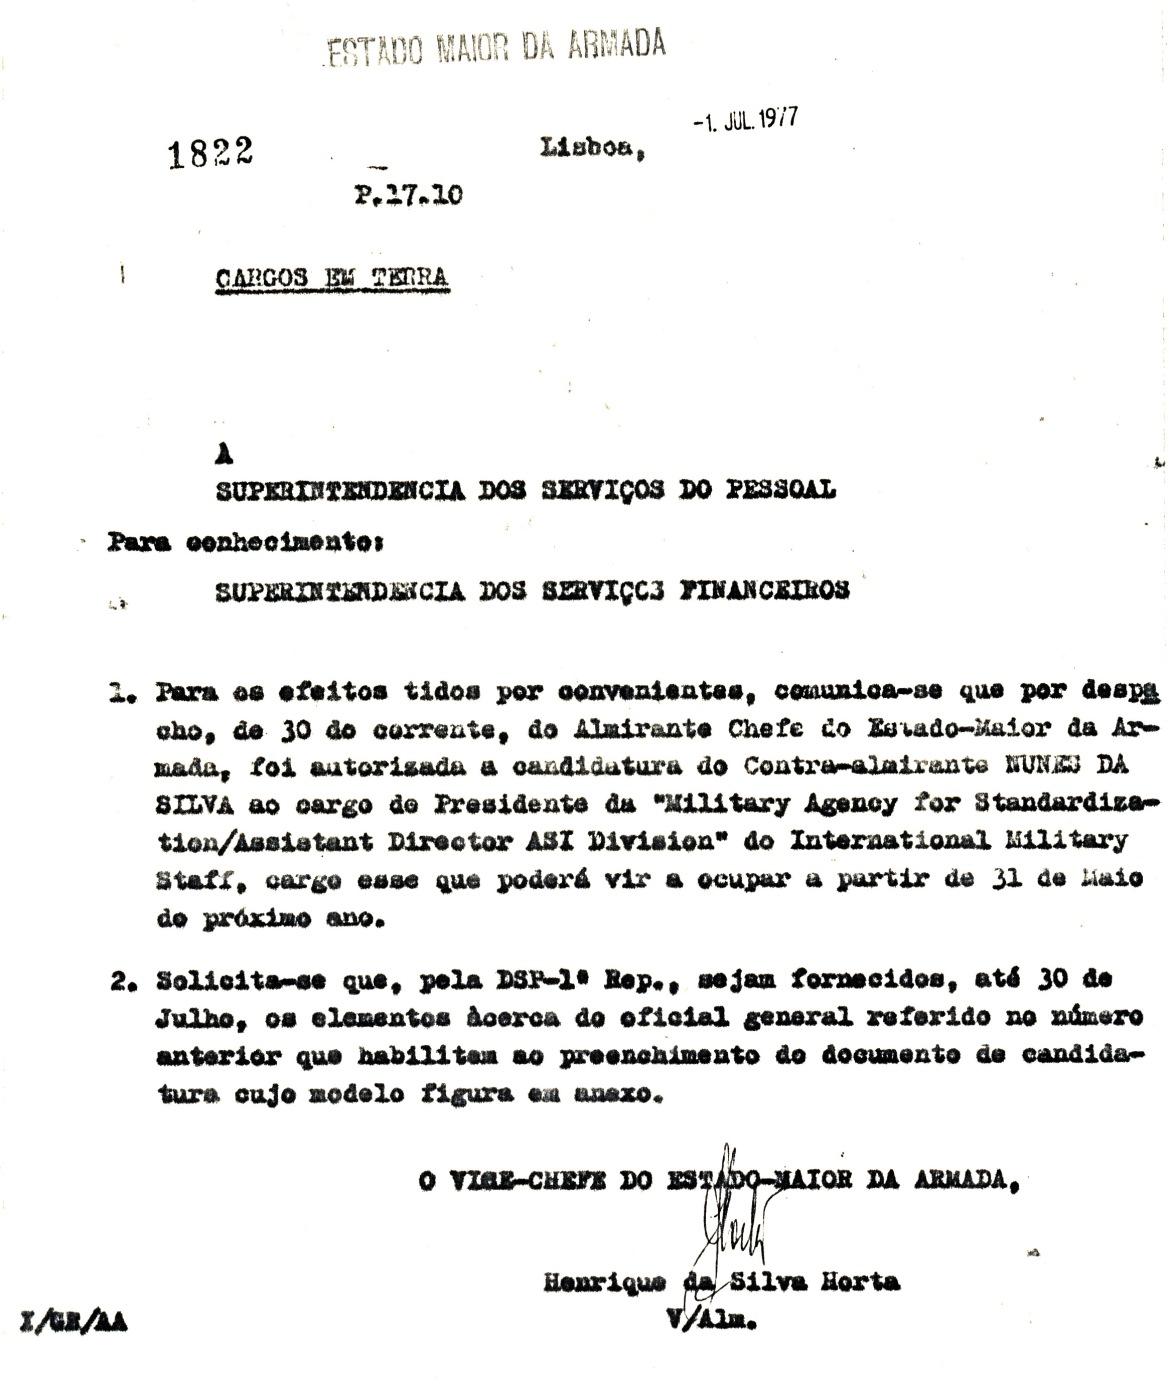 00825 977-07-01 Cargo na NATO - EMA comunica ter CEMA autorizado candidatura do C-Alm Nunes da Silva aos cargos NATO